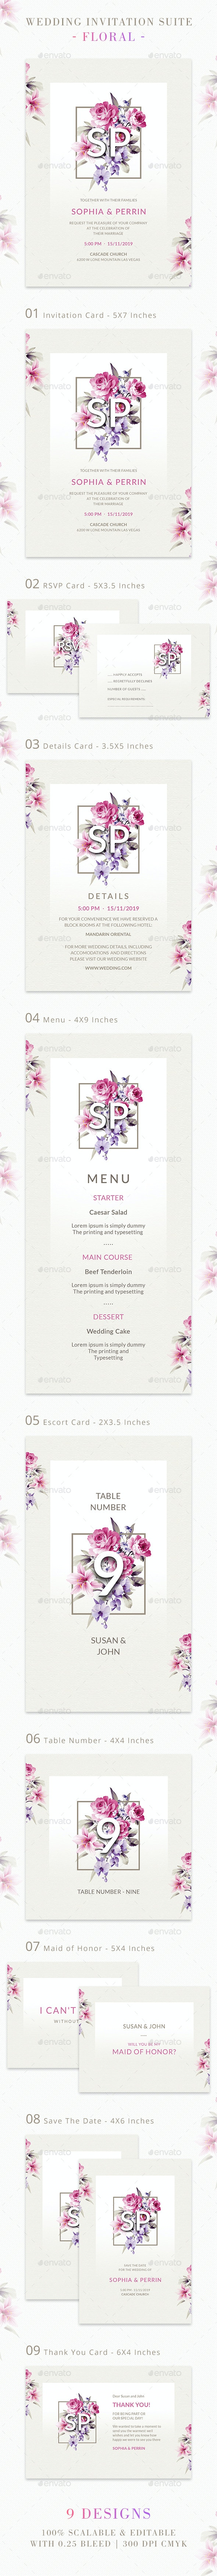 Wedding Invitation Suite - Floral - Weddings Cards & Invites